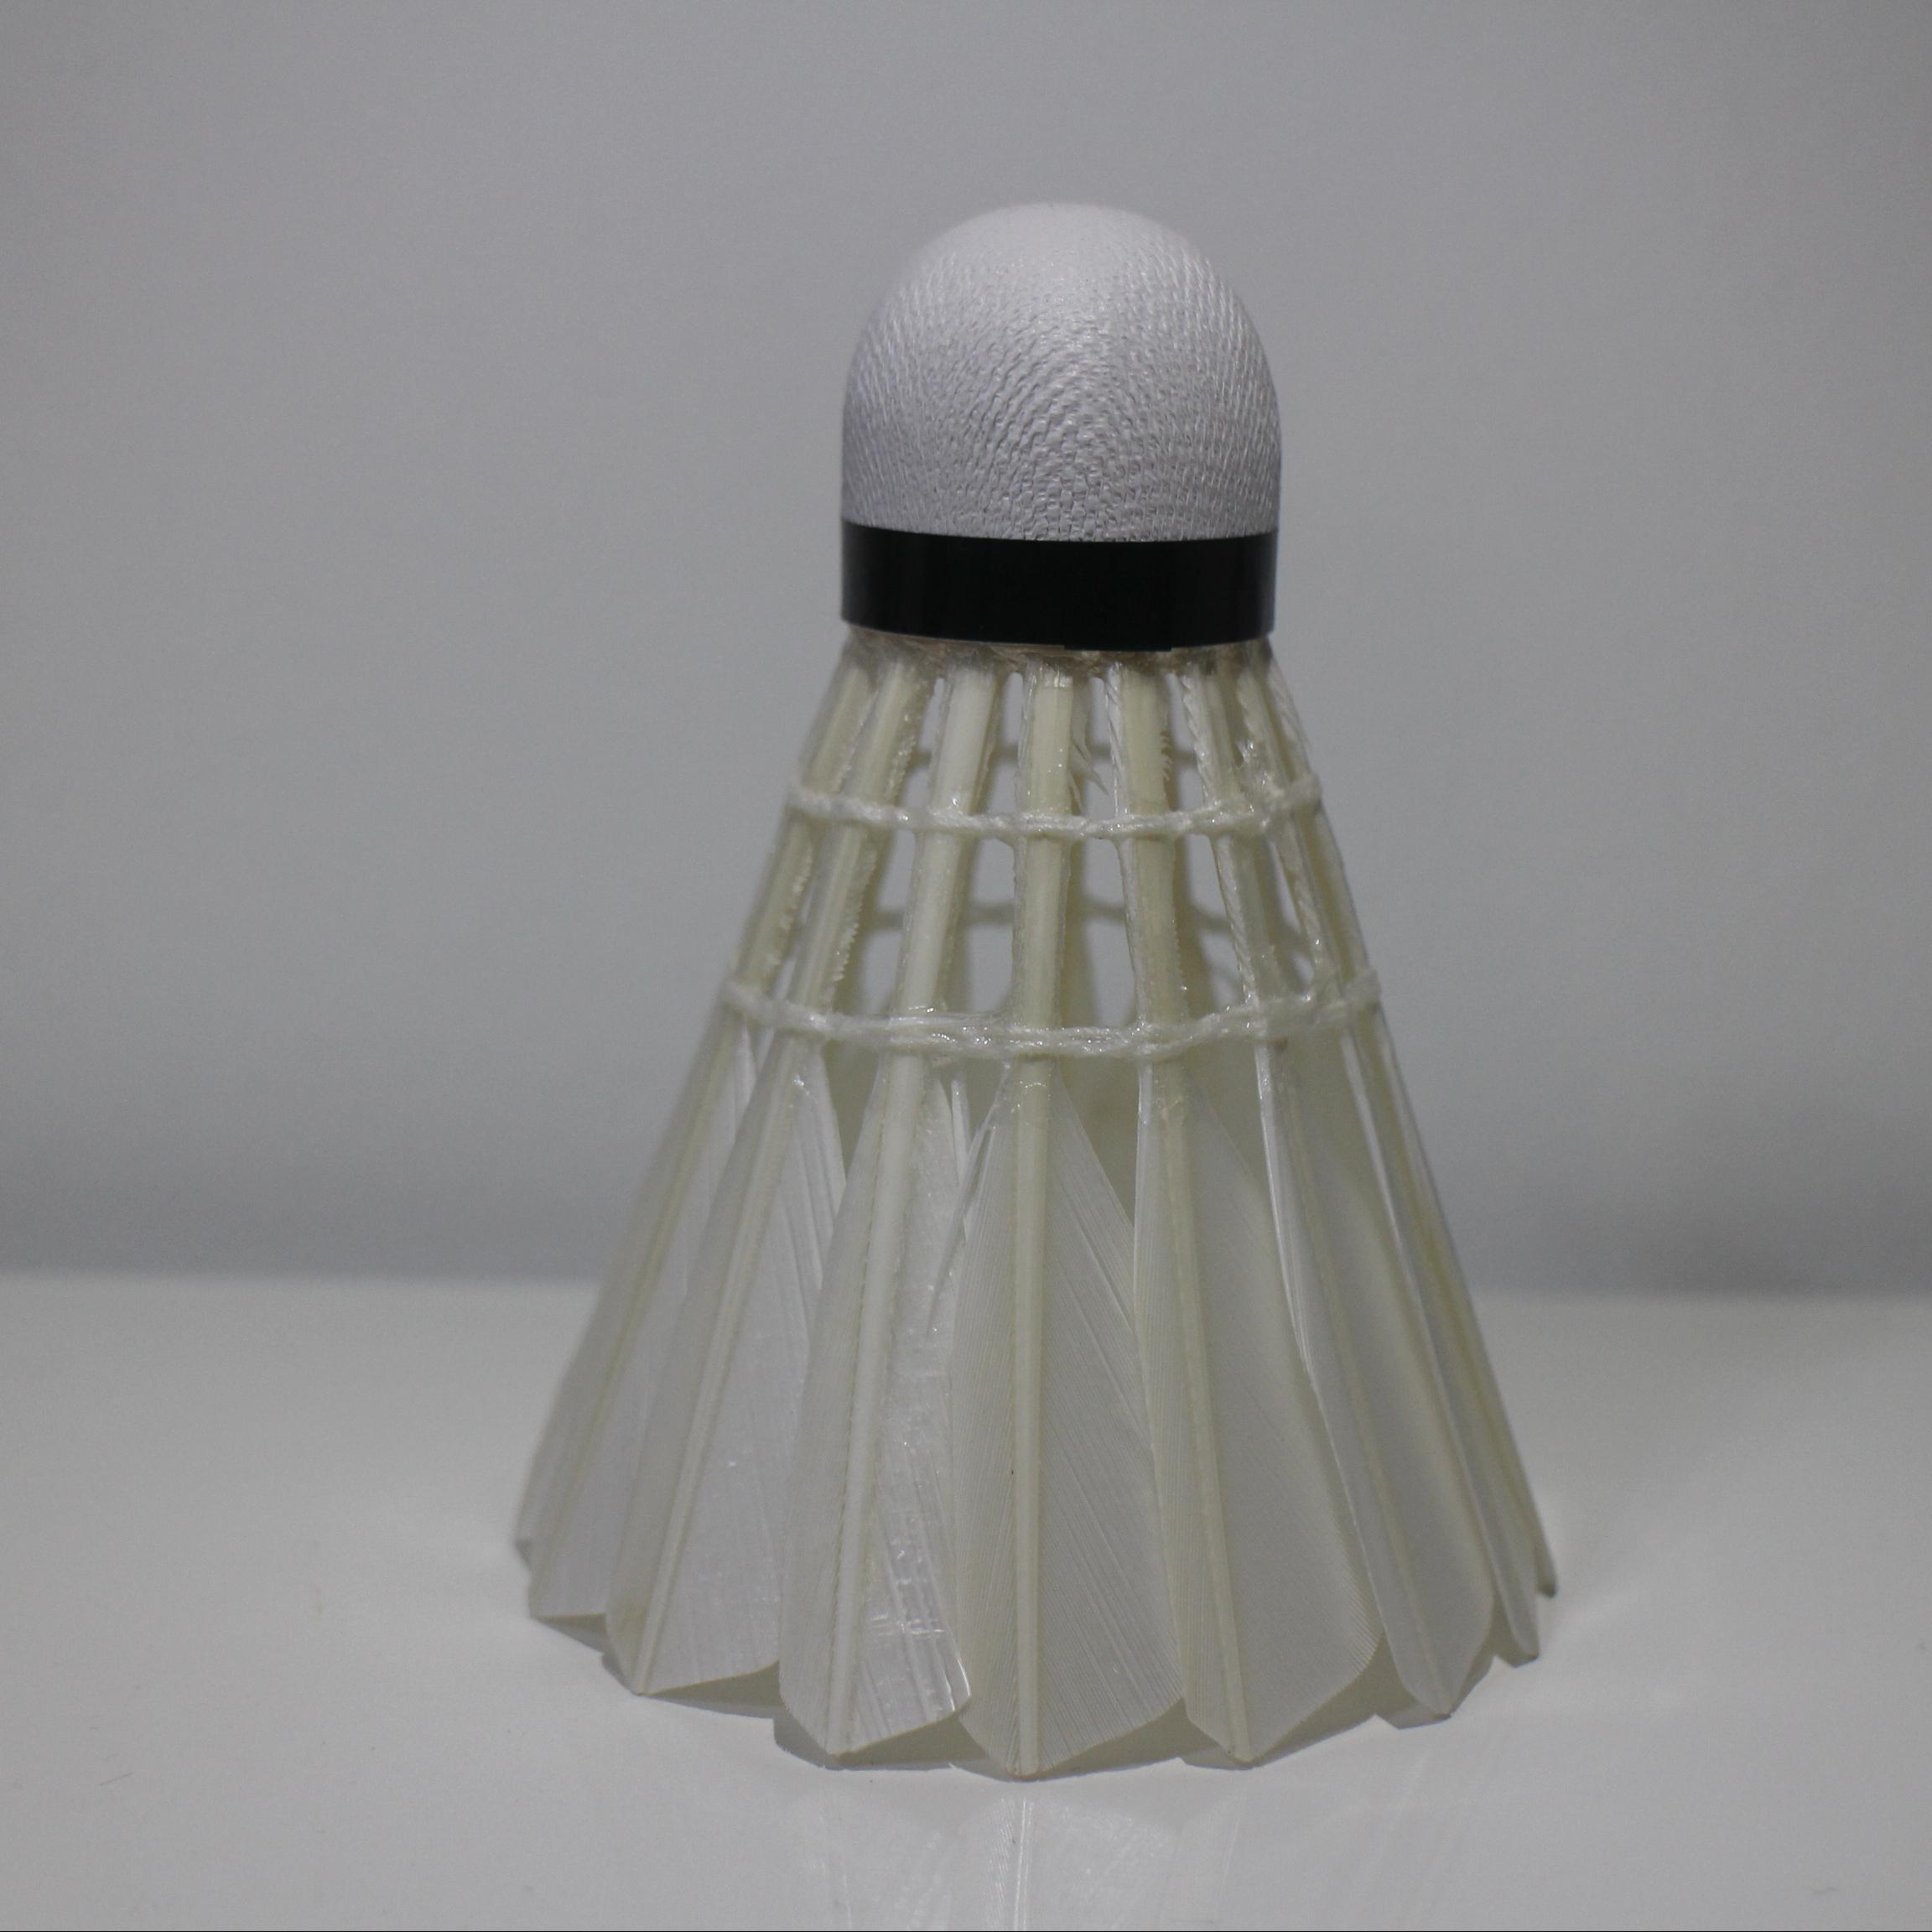 2 Dozen Kunli Kl-01 Duck Feather Durable Badminton Shuttlecocks For Tournament Bälle